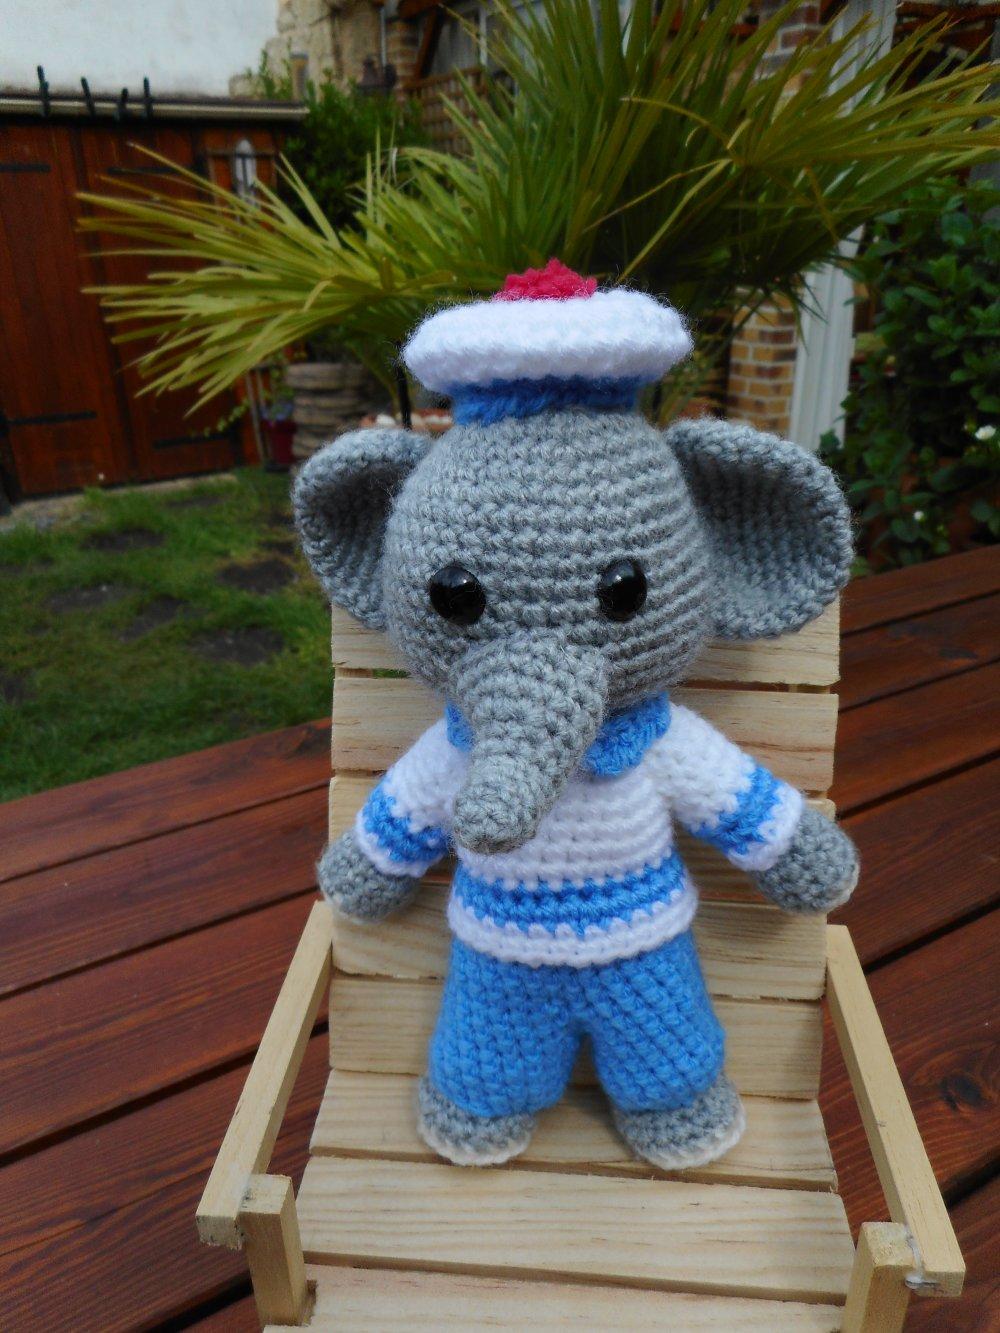 Patron gratuit Amigurumi éléphant au crochet | Crochet elephant ... | 1333x1000